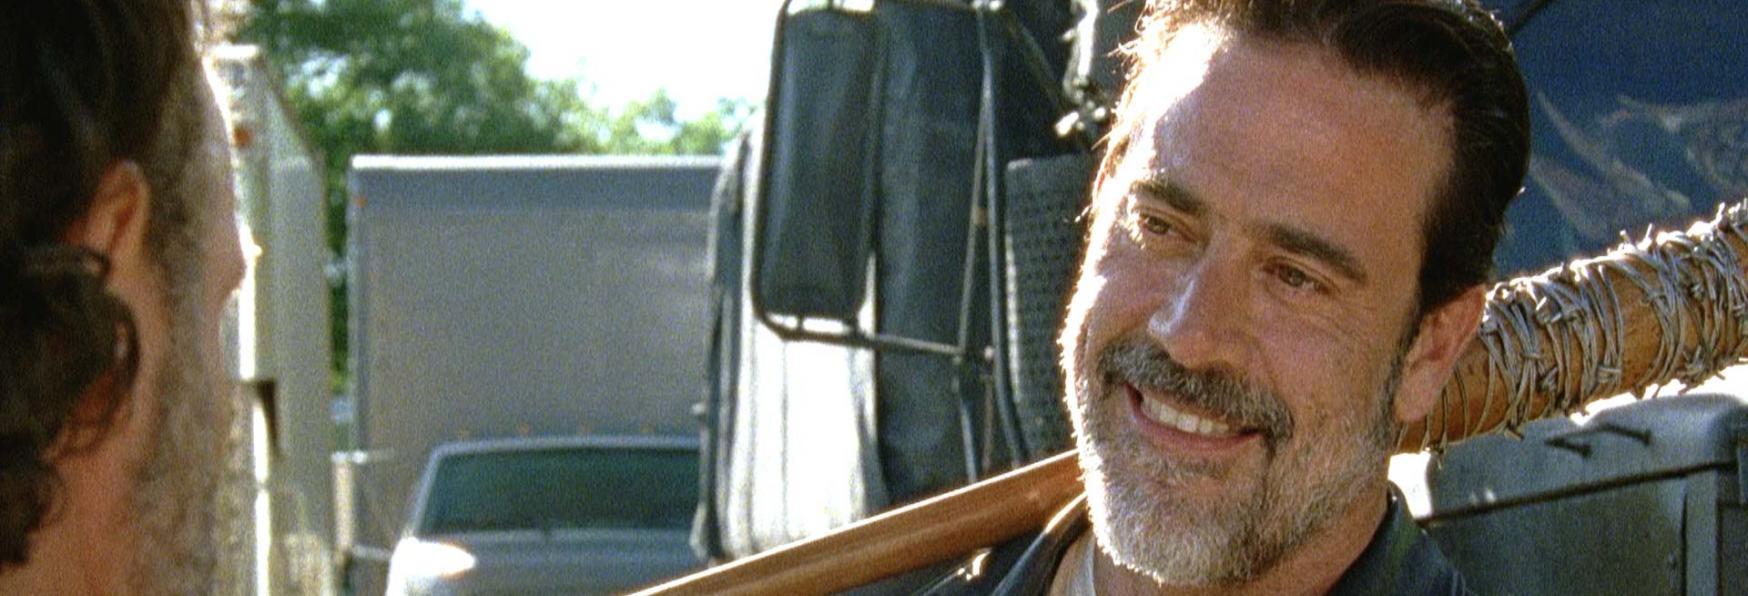 The Walking Dead 11: vedremo Jeffrey Dean Morgan (Negan) nella Stagione Finale?